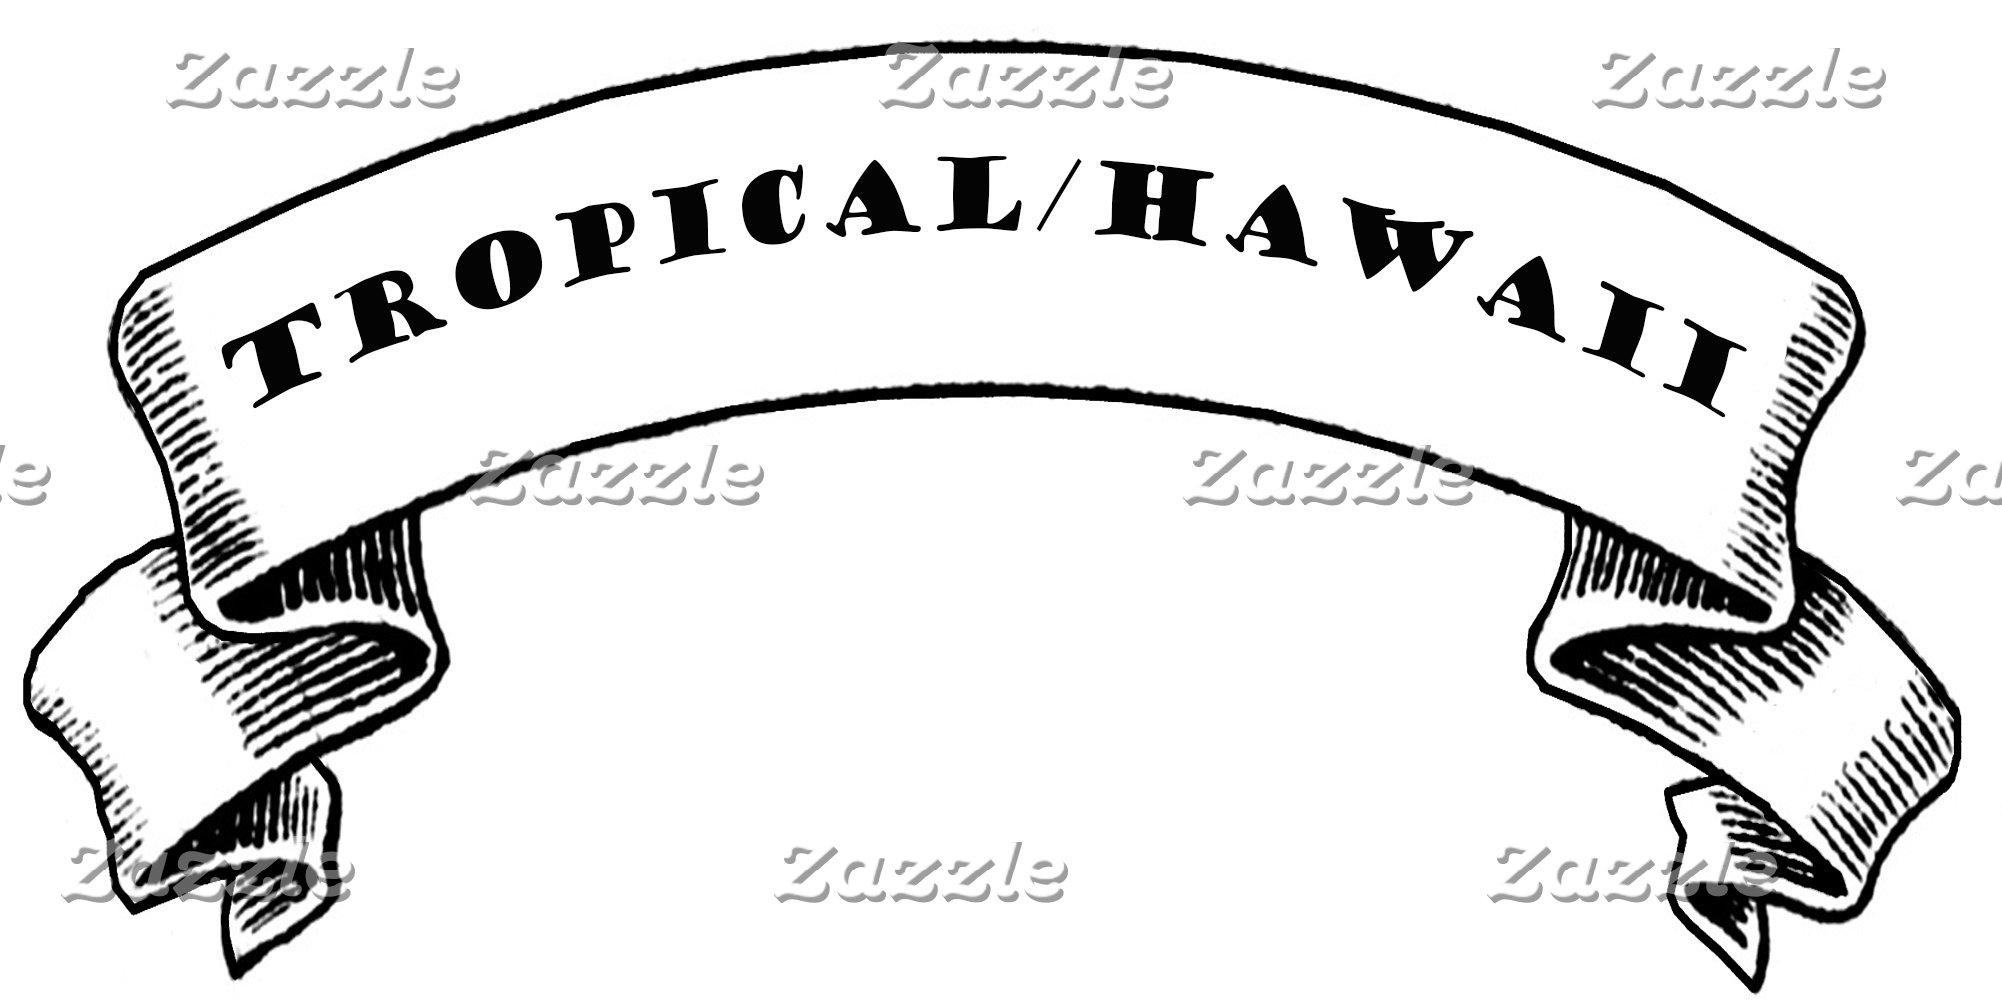 Tropical/Hawaii theme